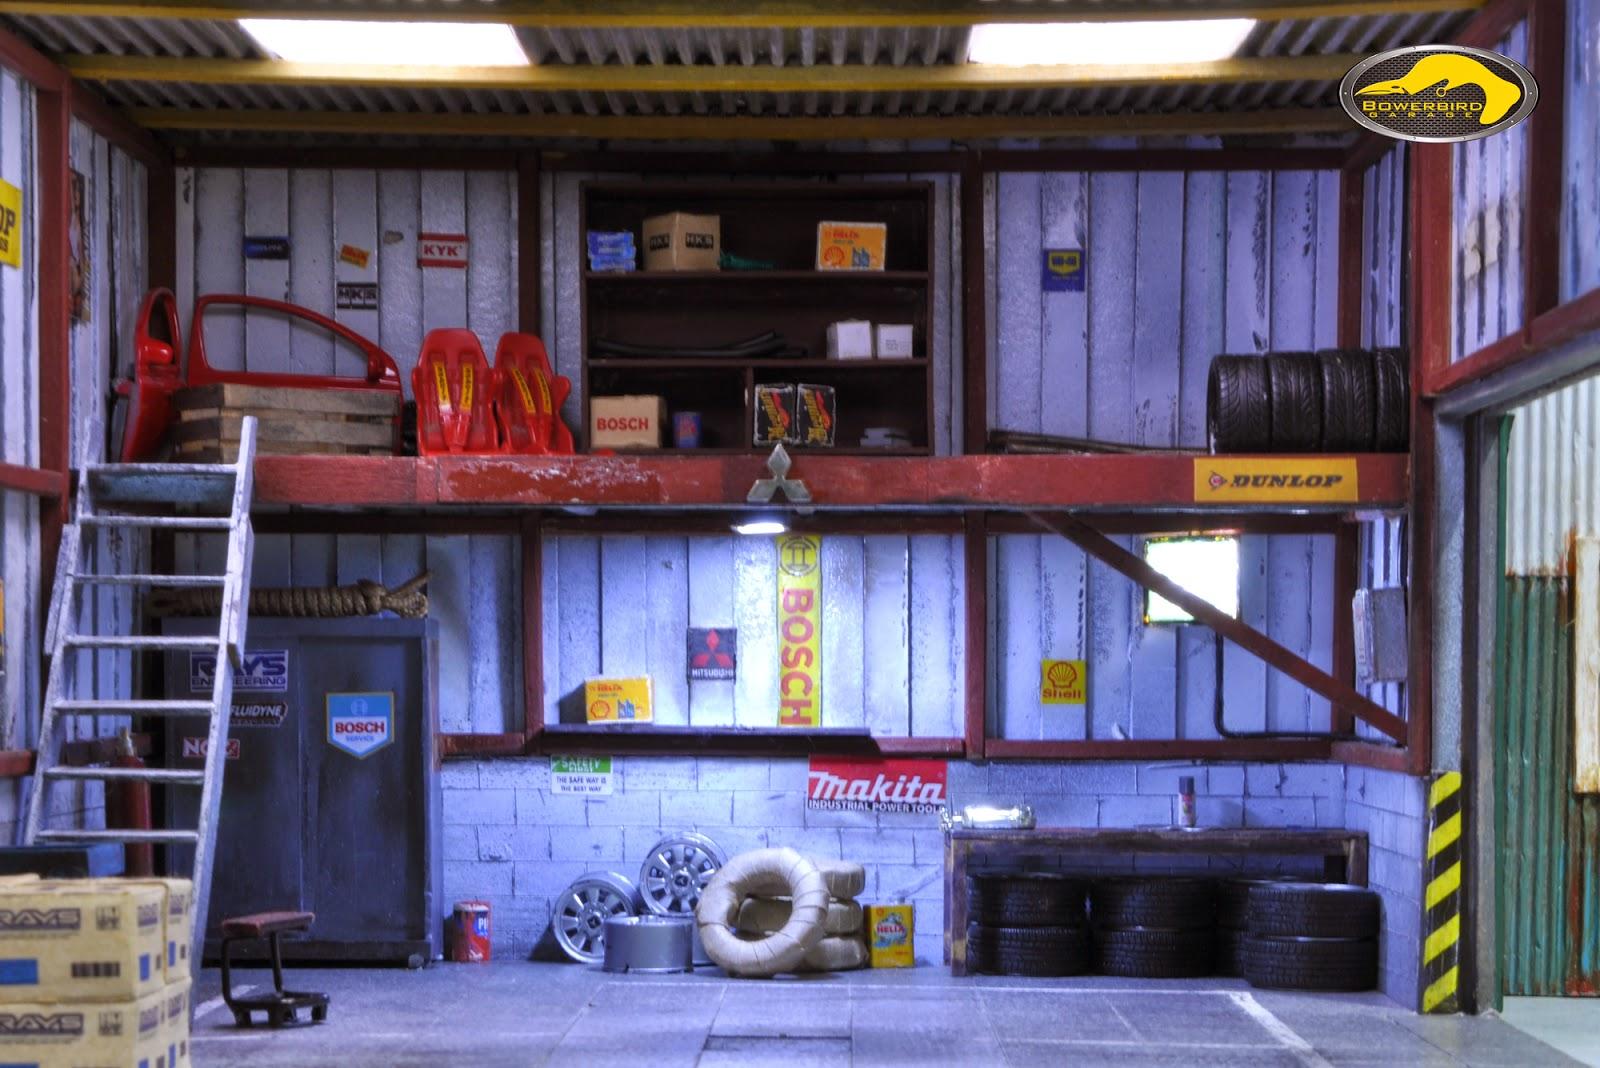 Bowerbird Garage Diorama Jdm Garage Diorama Jinri 3 0